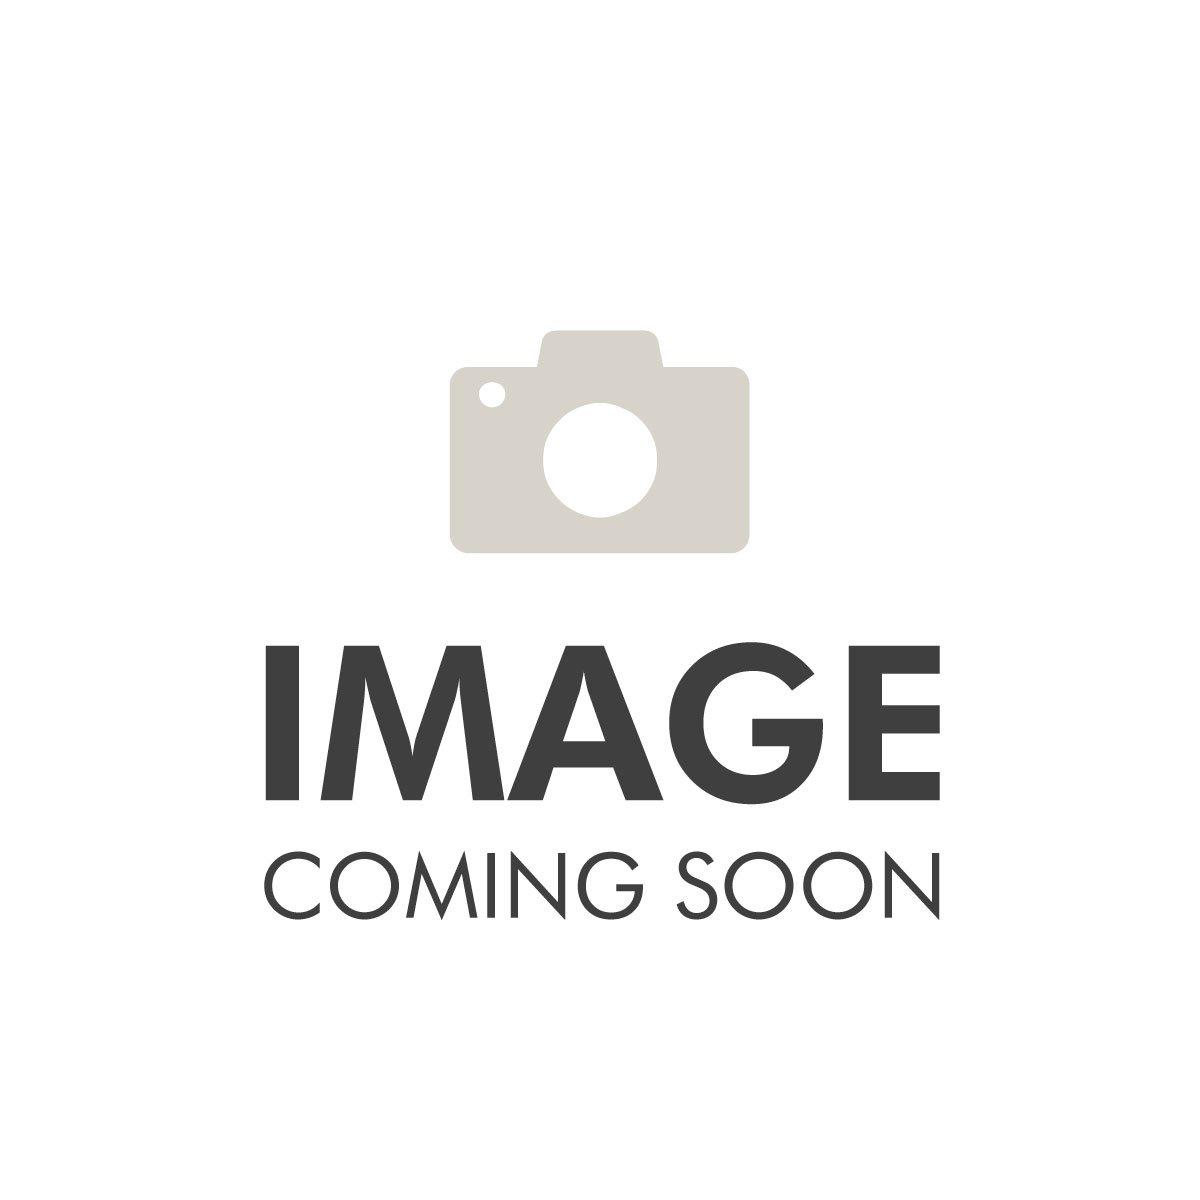 Thierry Mugler Angel Gift Set 50ml EDP + 200ml Body Cream + 100 Shower Gel + 30ml Hair Mist